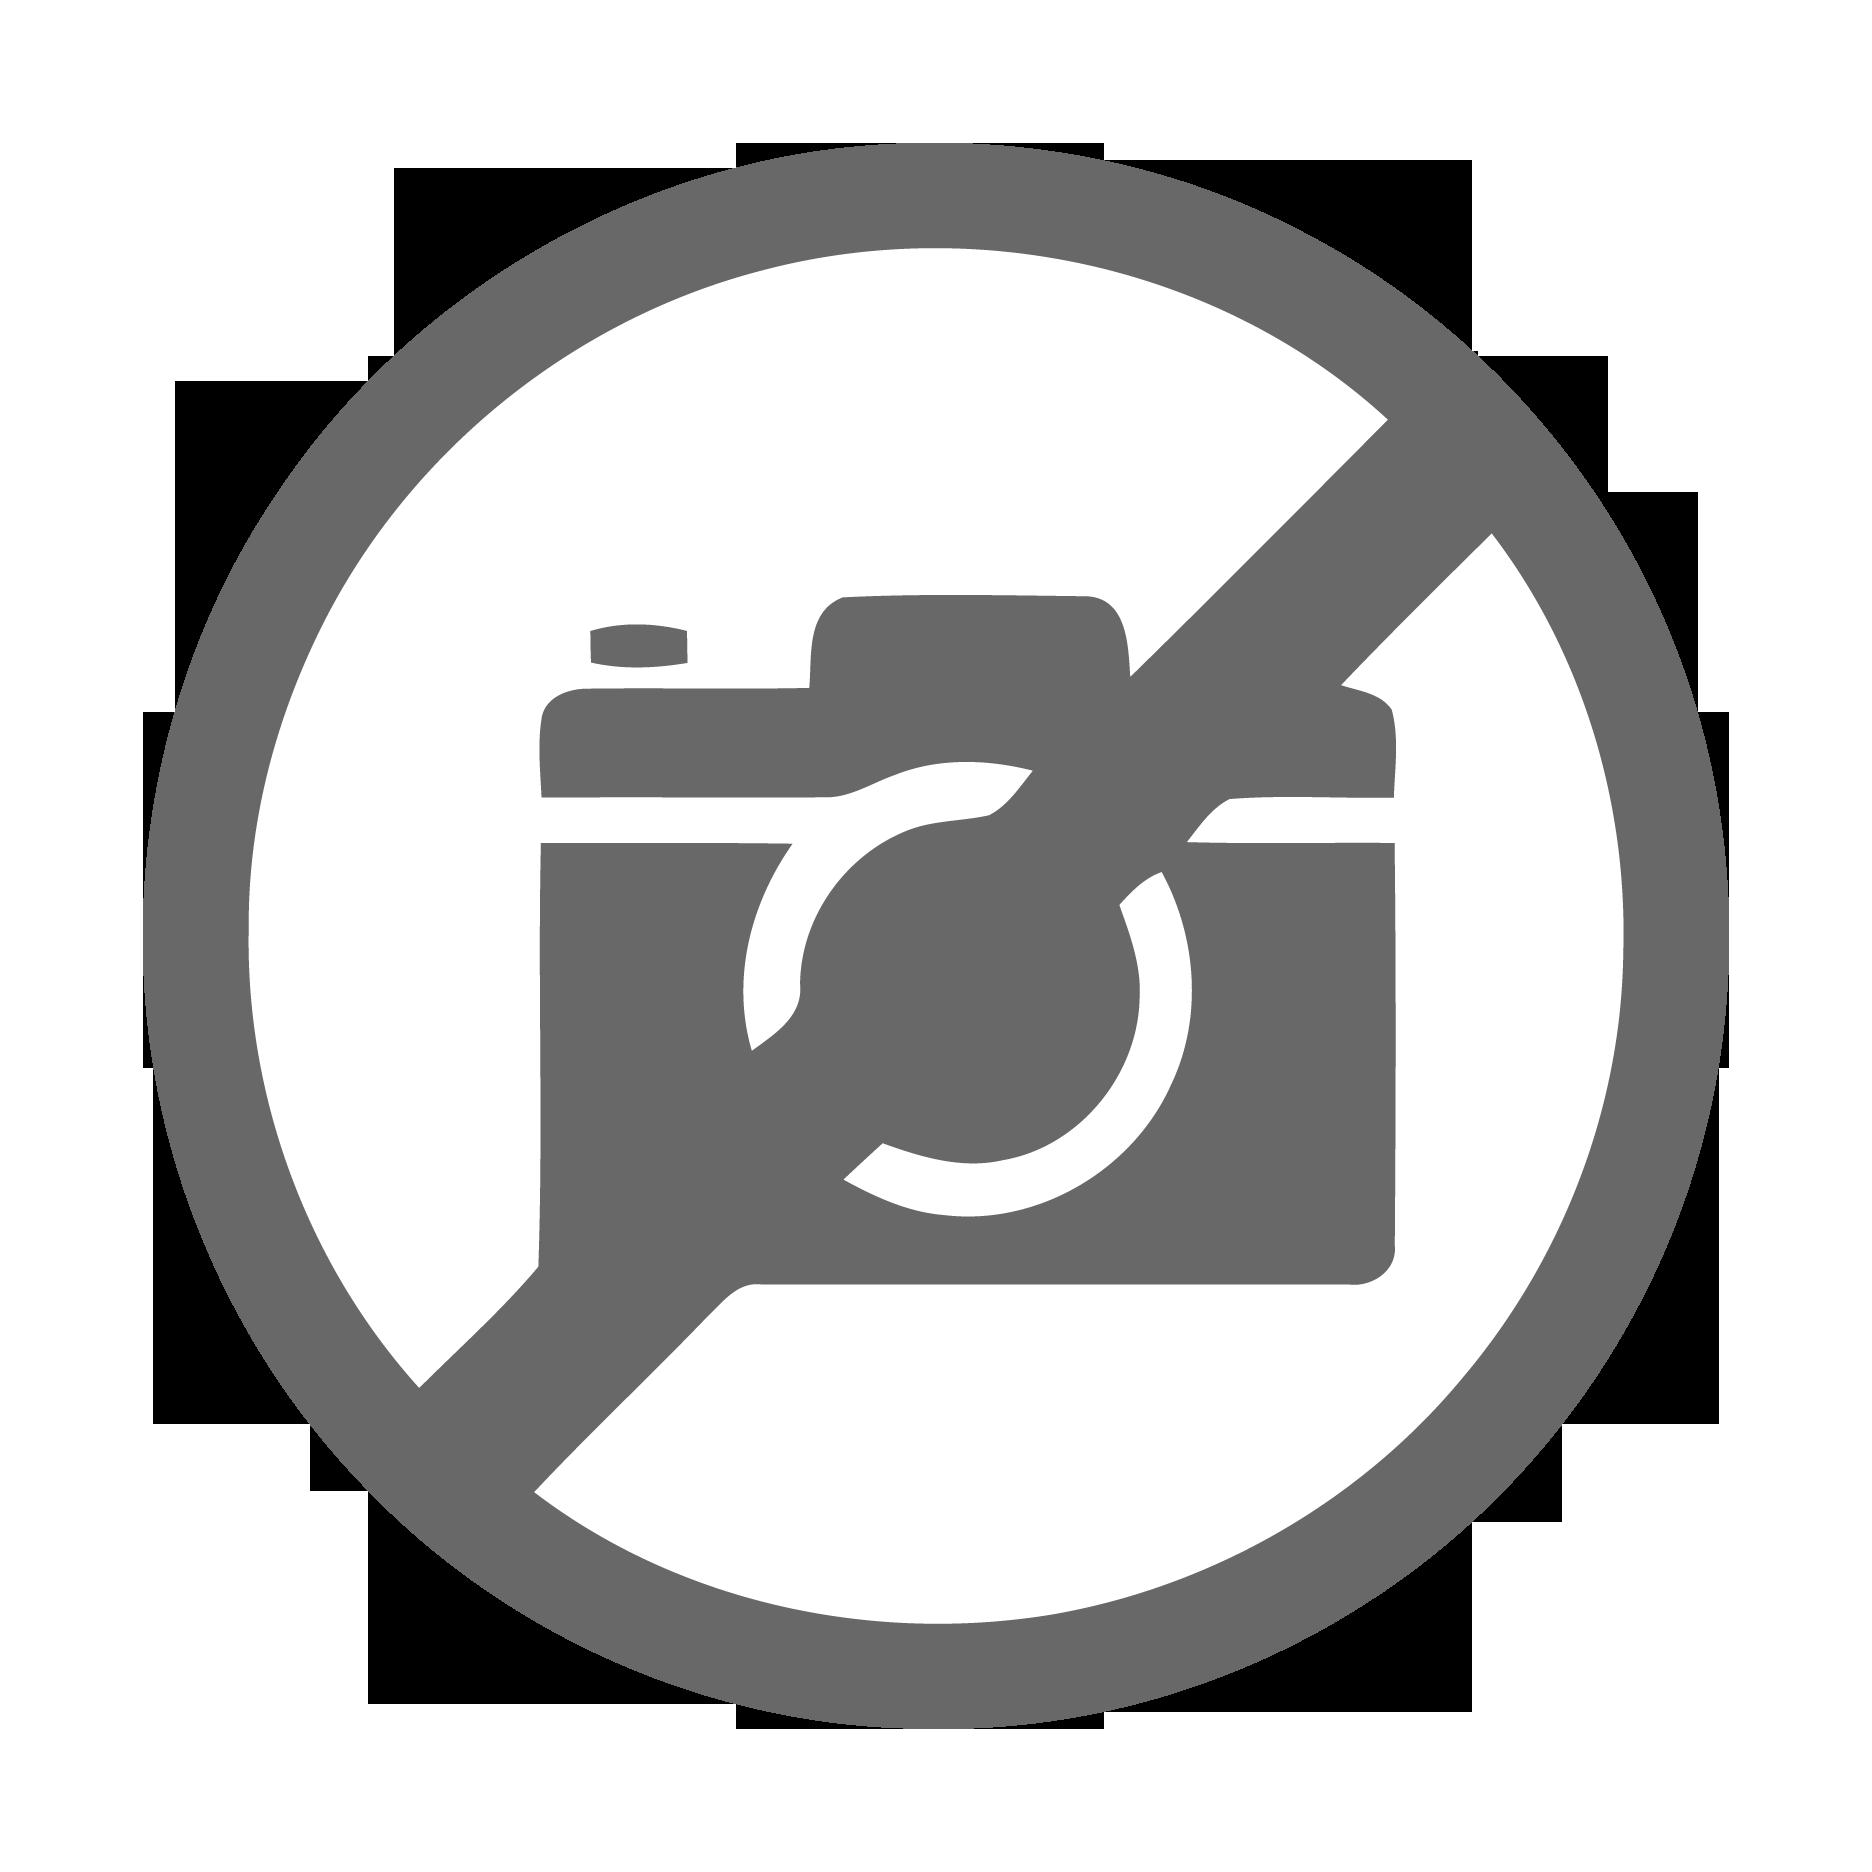 The Burger Faktory